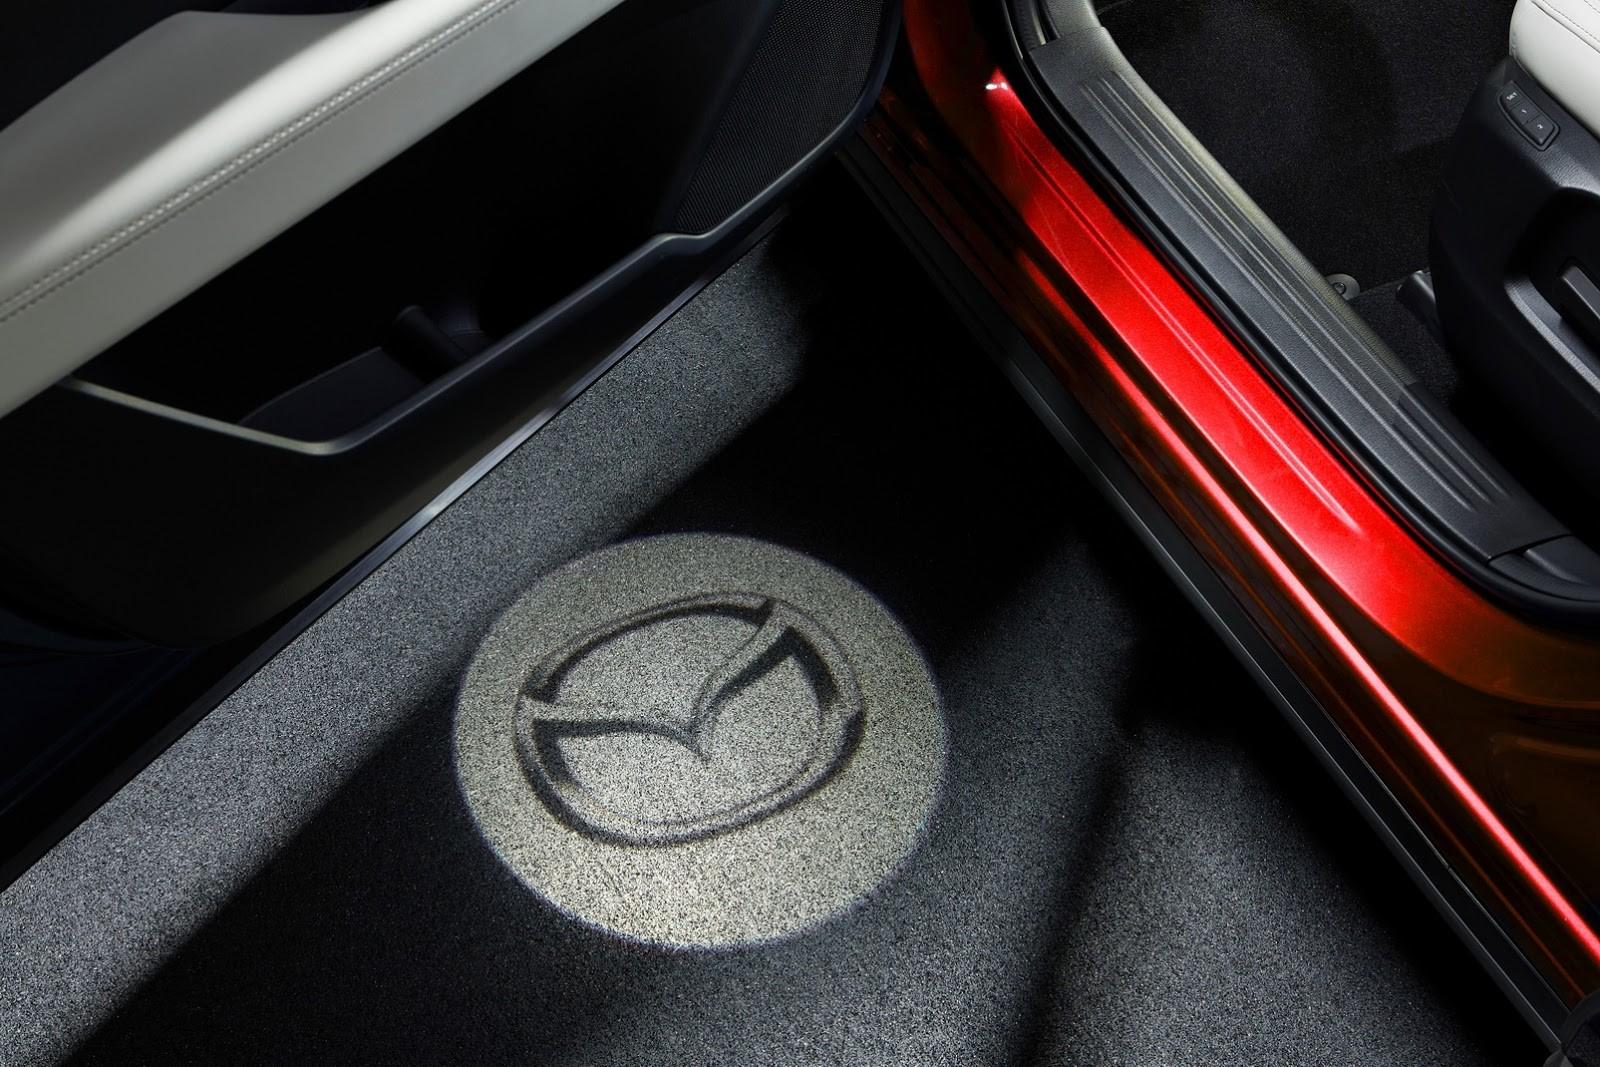 Foto de Accesorios para Mazda CX-3 - CX-5 (7/12)